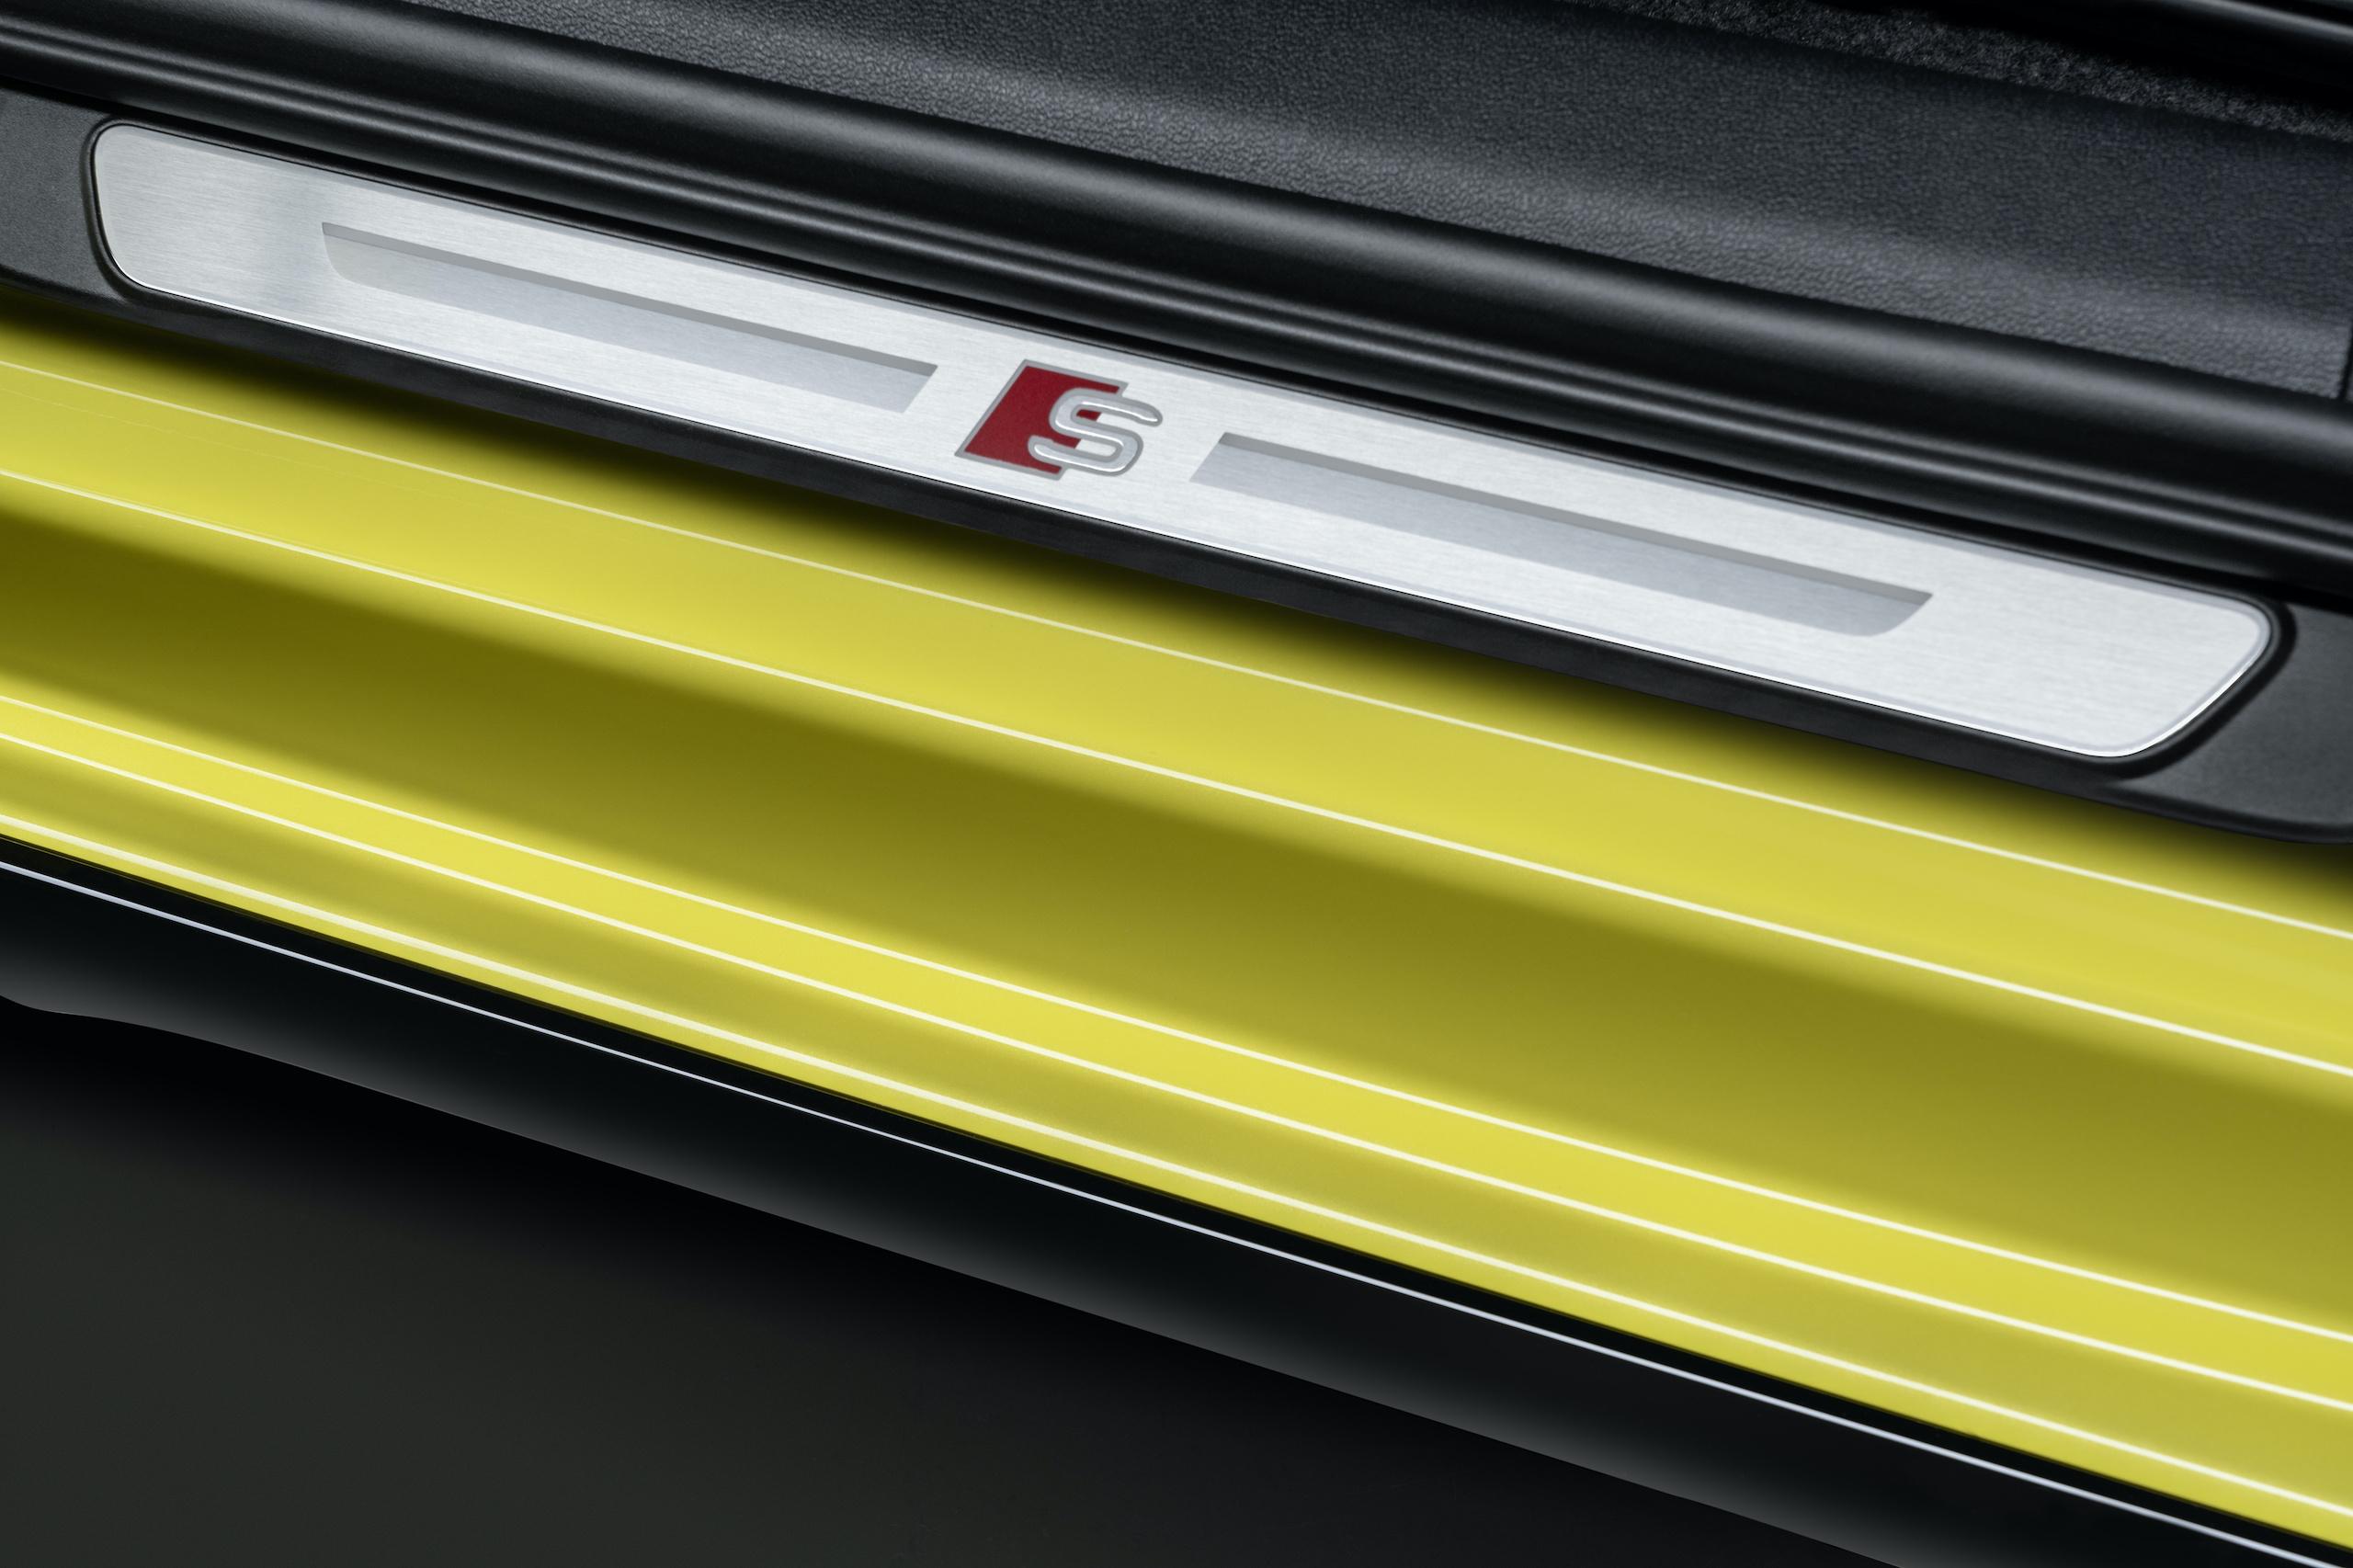 Audi S3 Sportback python yellow door sill